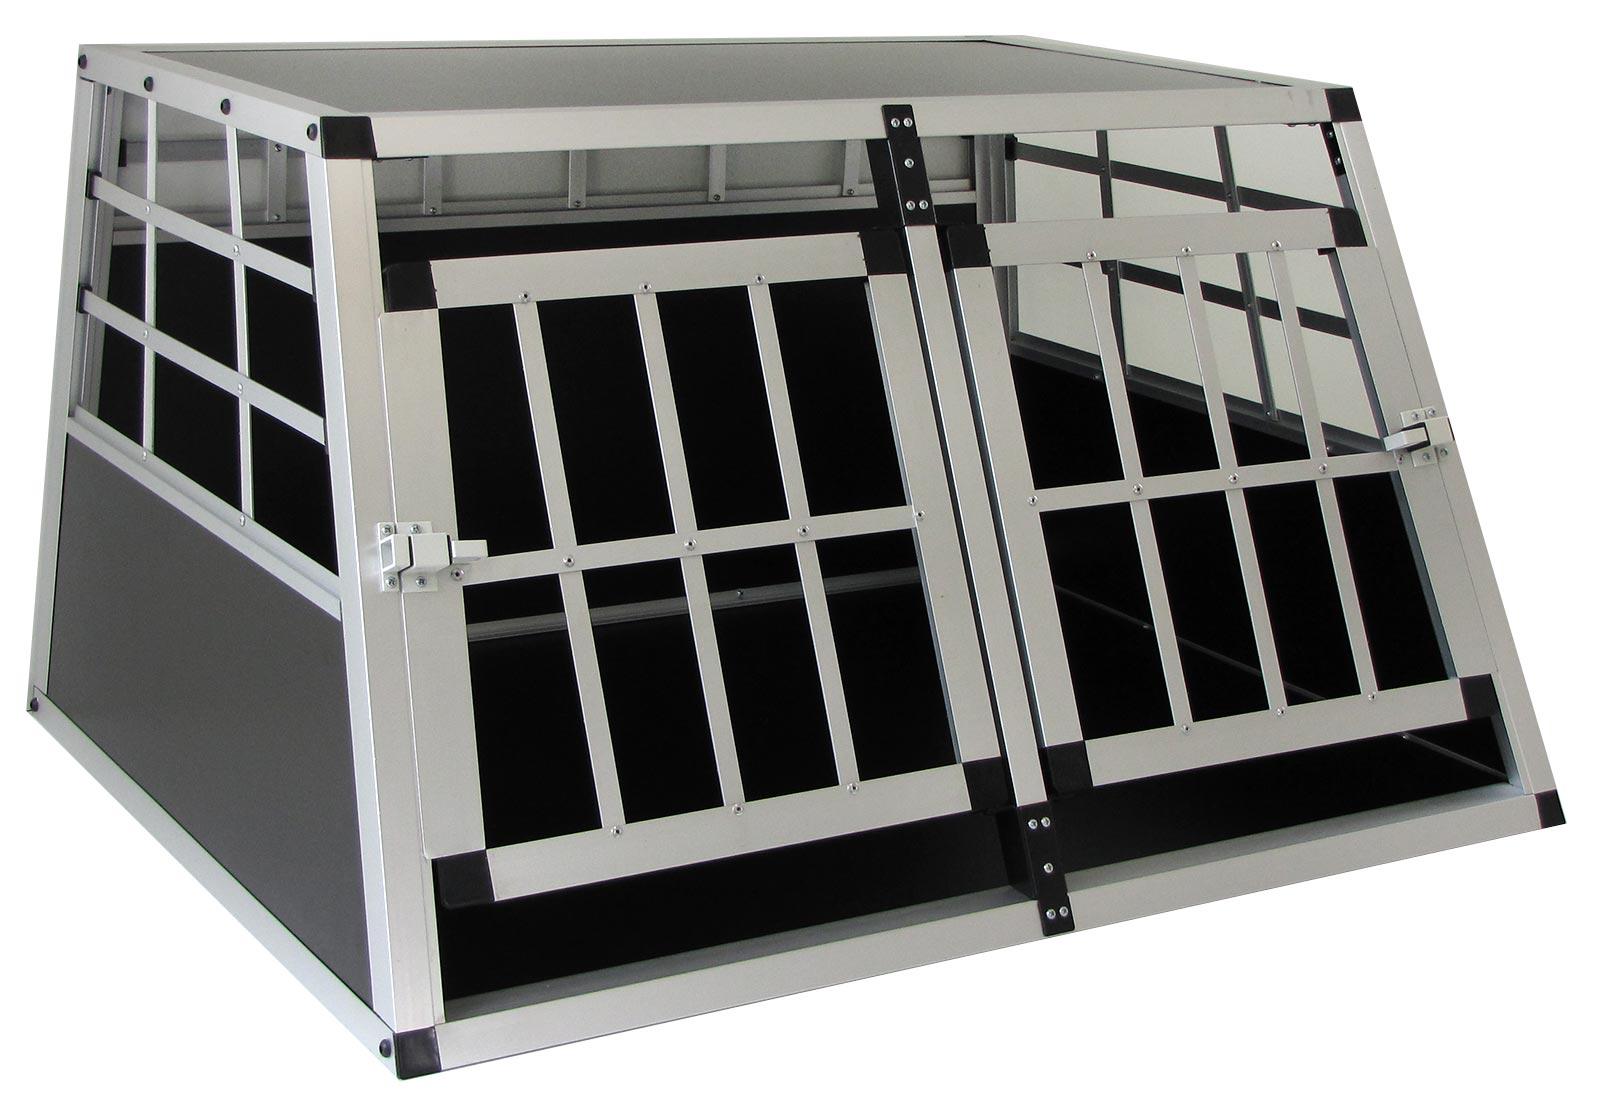 Carparts-Online 29954 Alu Hunde Tier Reise Auto Transport Box mit T/ür